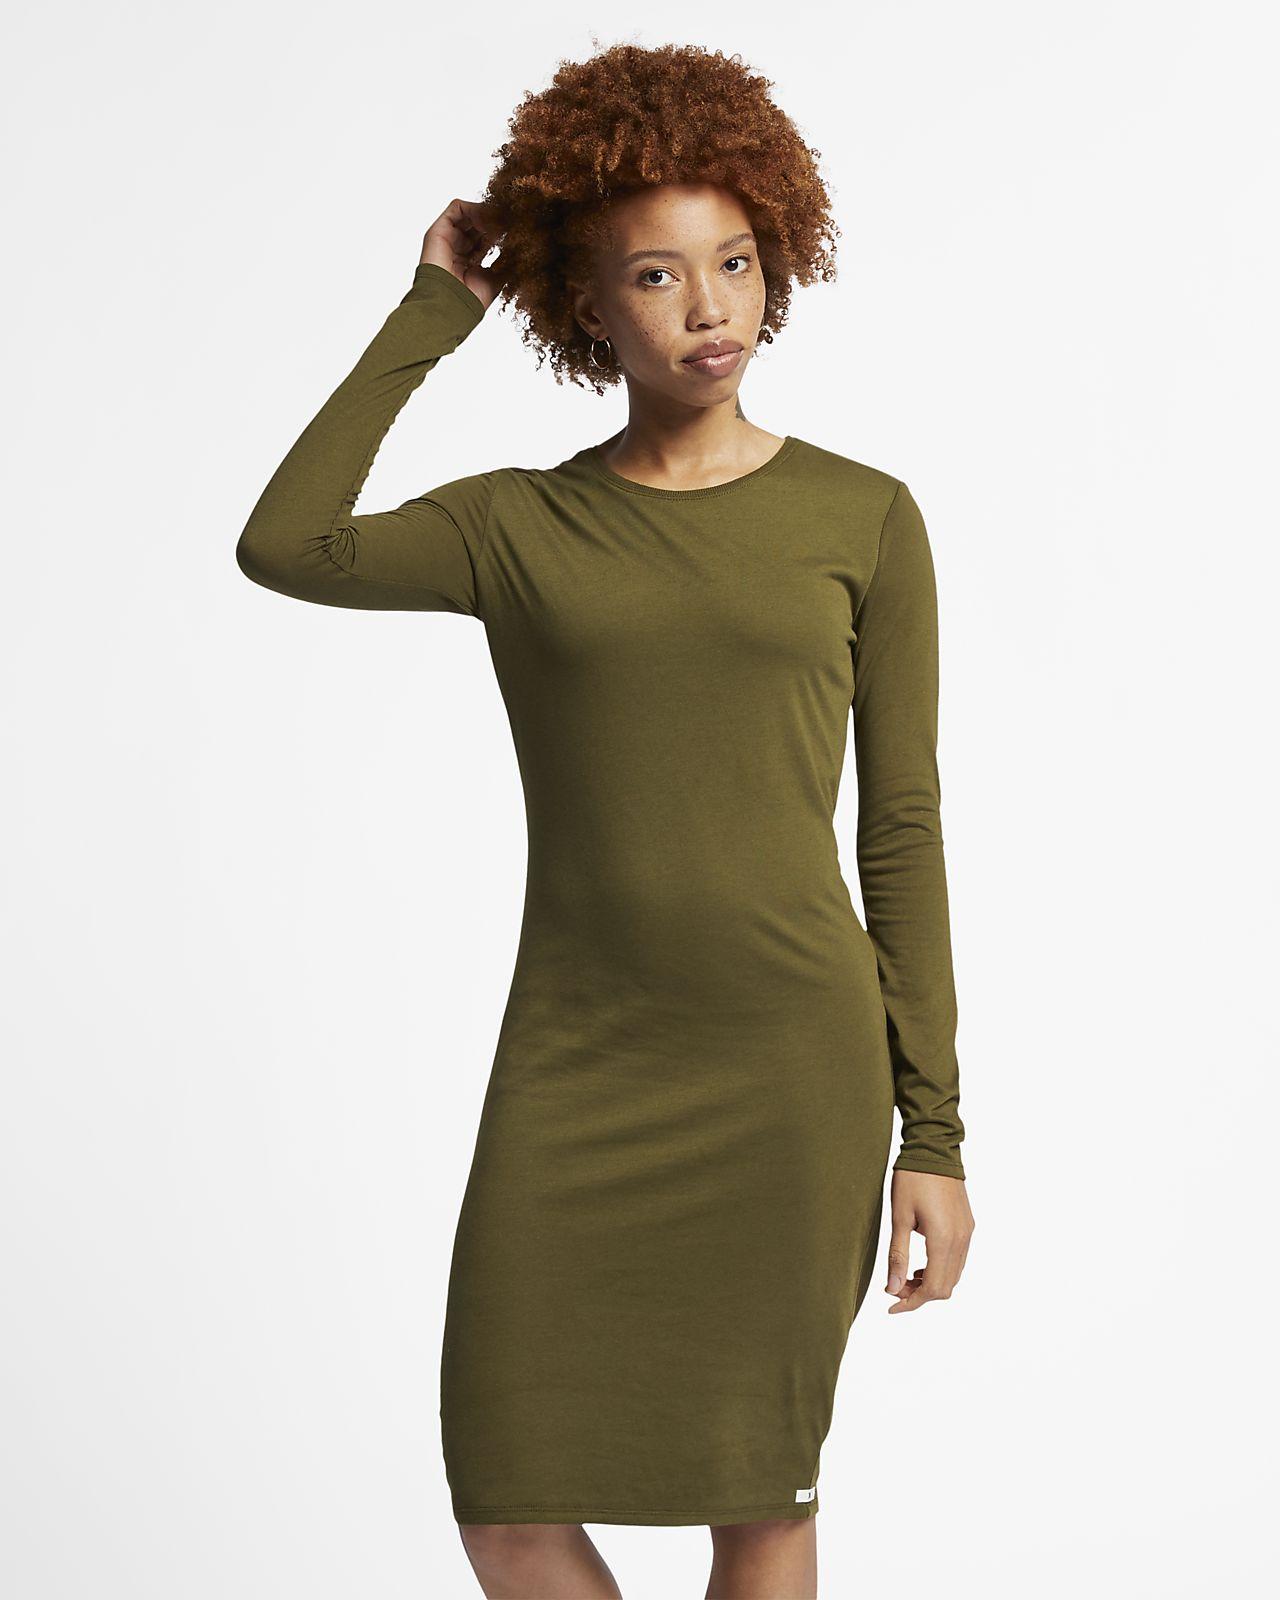 Hurley Dri-FIT  Women's Long-Sleeve Dress